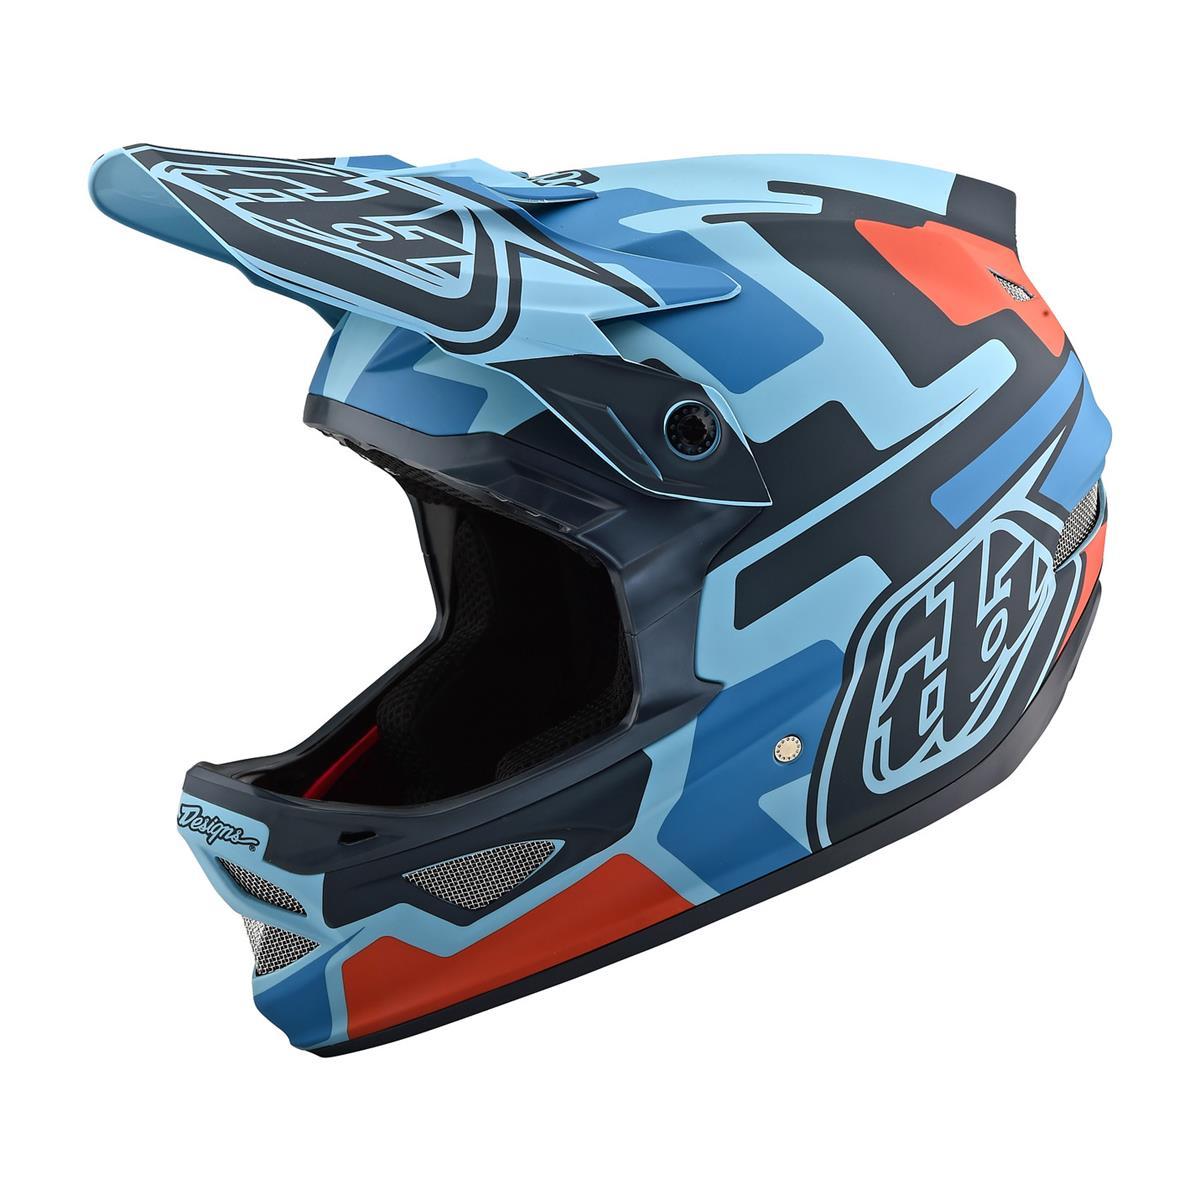 Troy Lee Designs Downhill-MTB-Helm D3 Fiberlite Speedcode - Blau/Schwarz